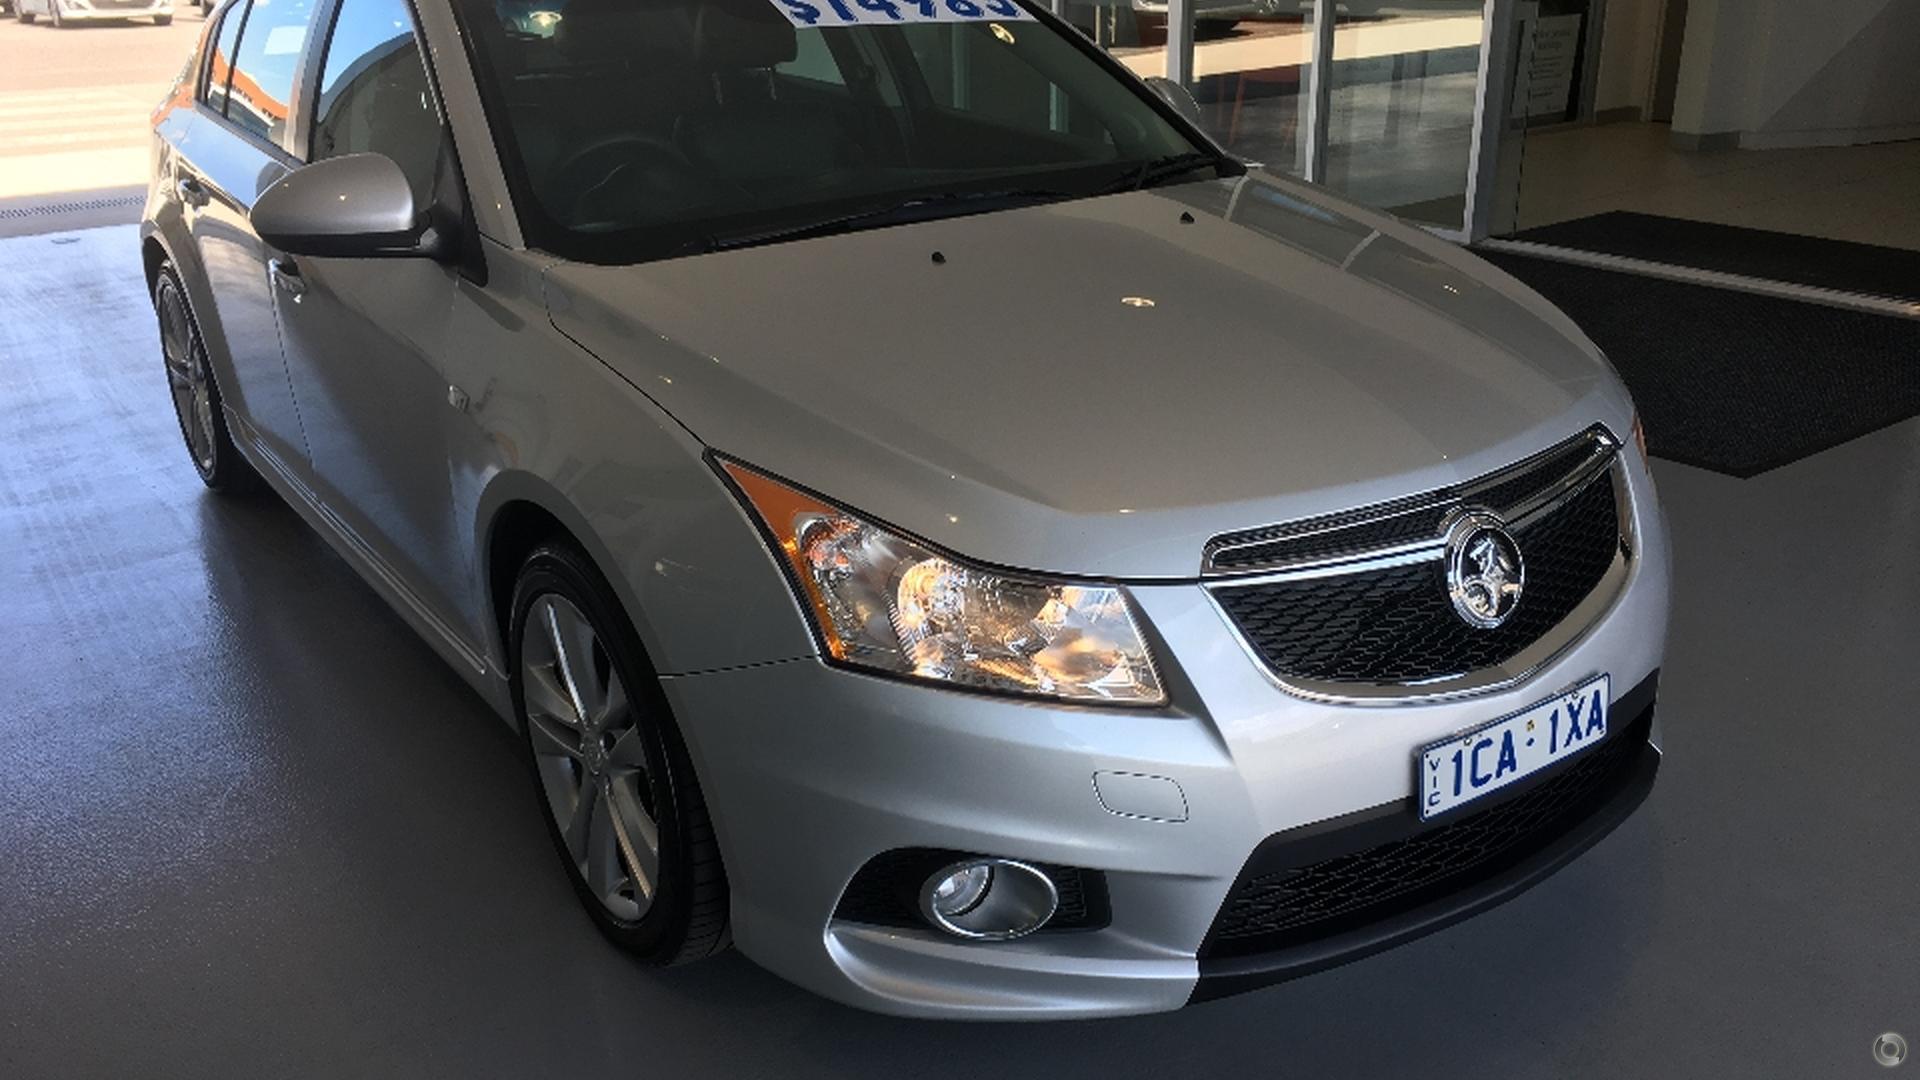 2014 Holden Cruze SRi-V JH Series II